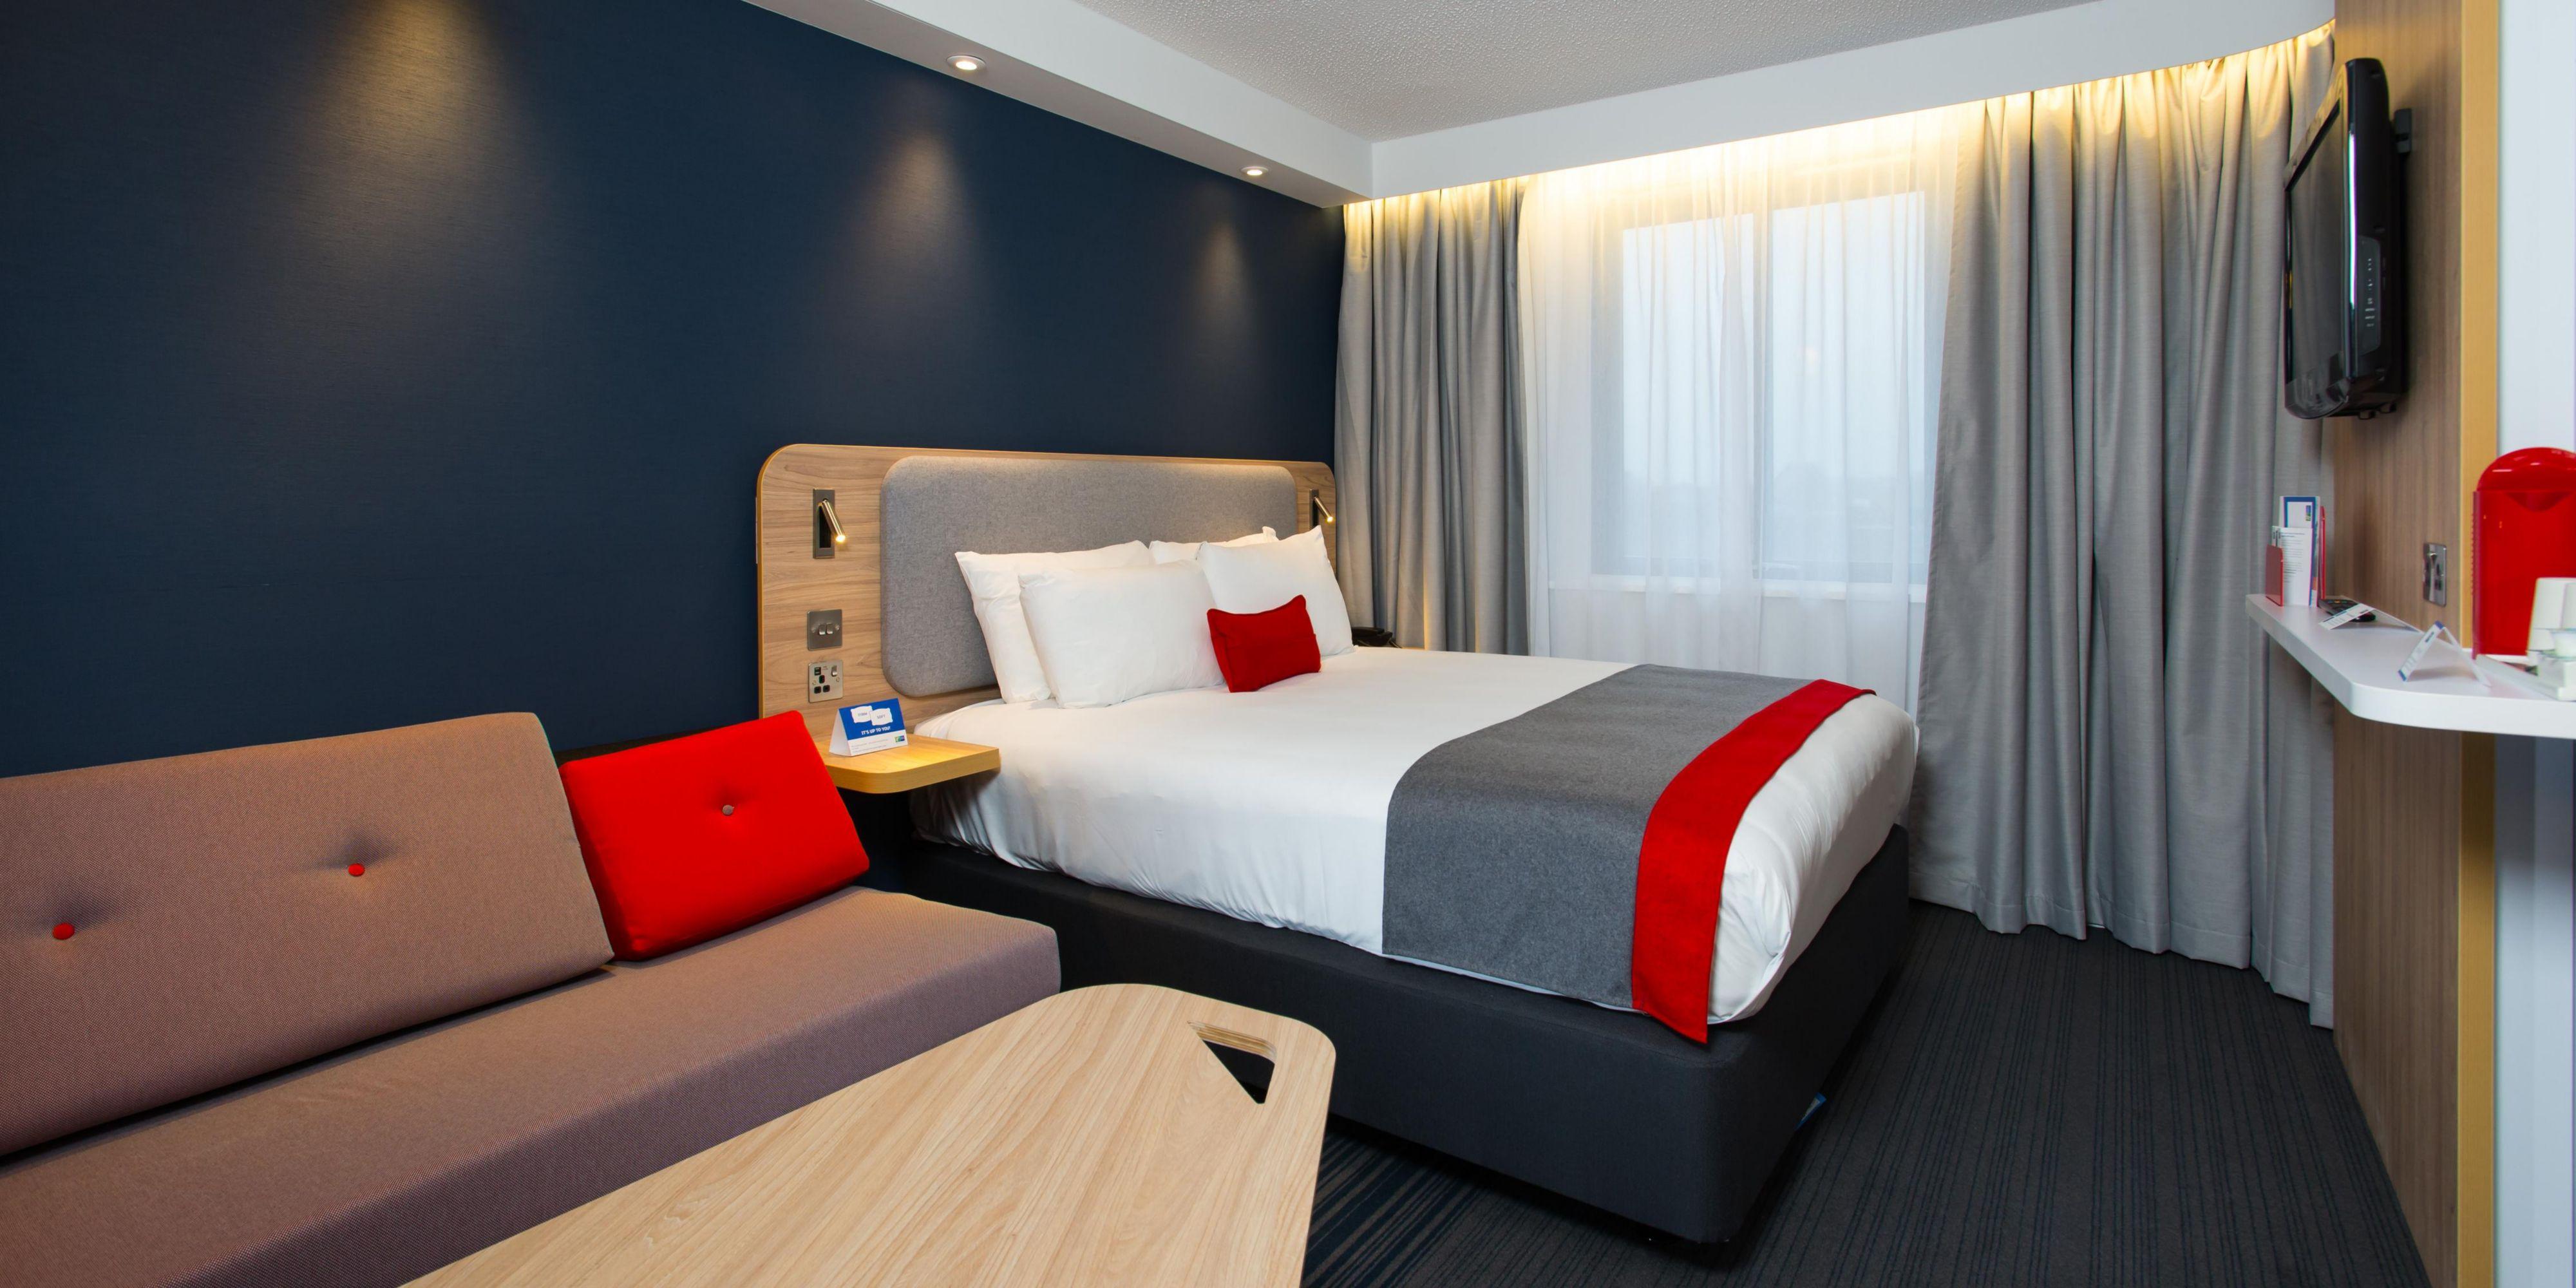 Holiday Inn Express Hotel London Luton Airport